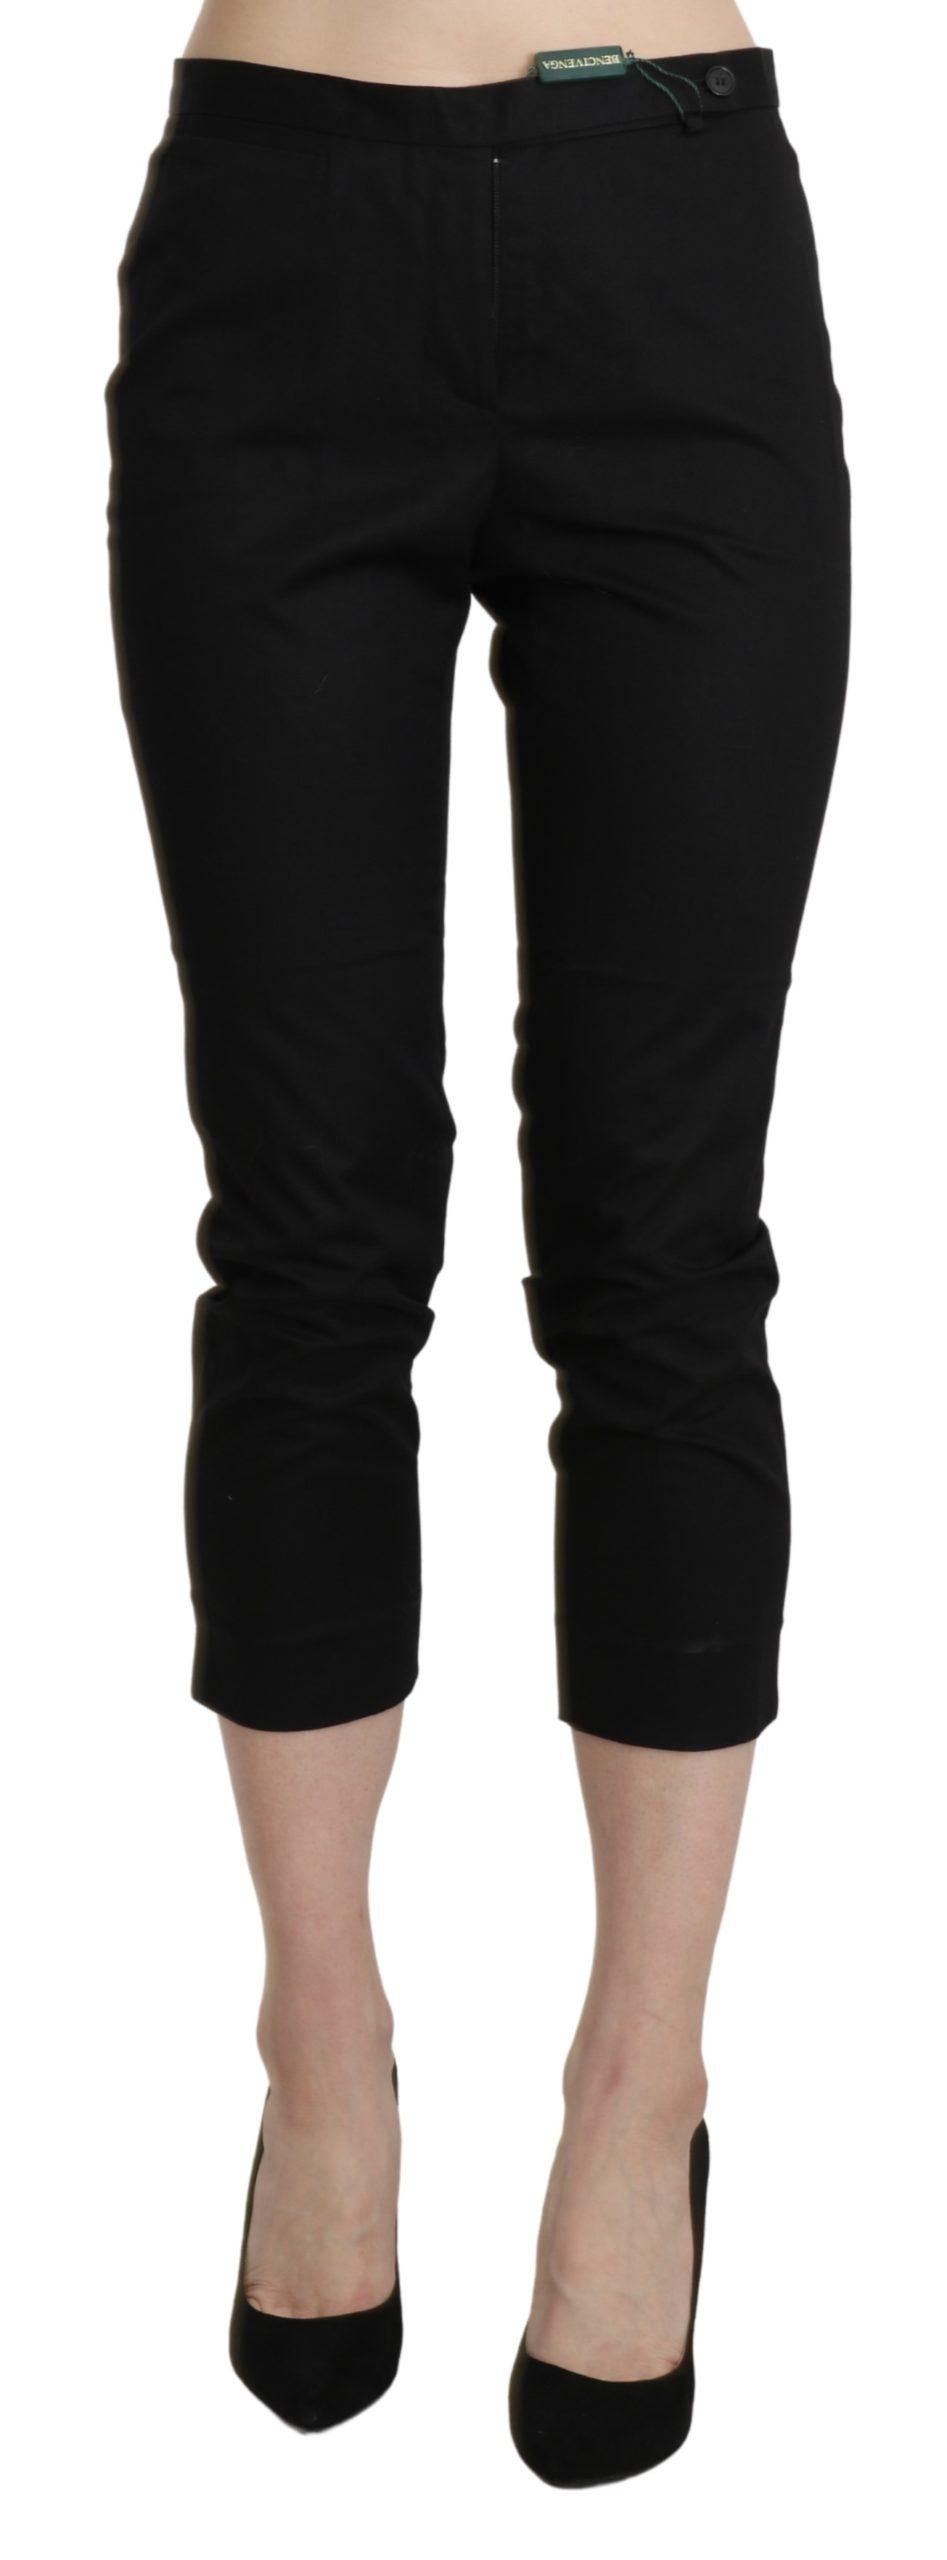 BENCIVENGA Women's High Waist Skinny Trouser Black PAN71332-44 - IT44 L